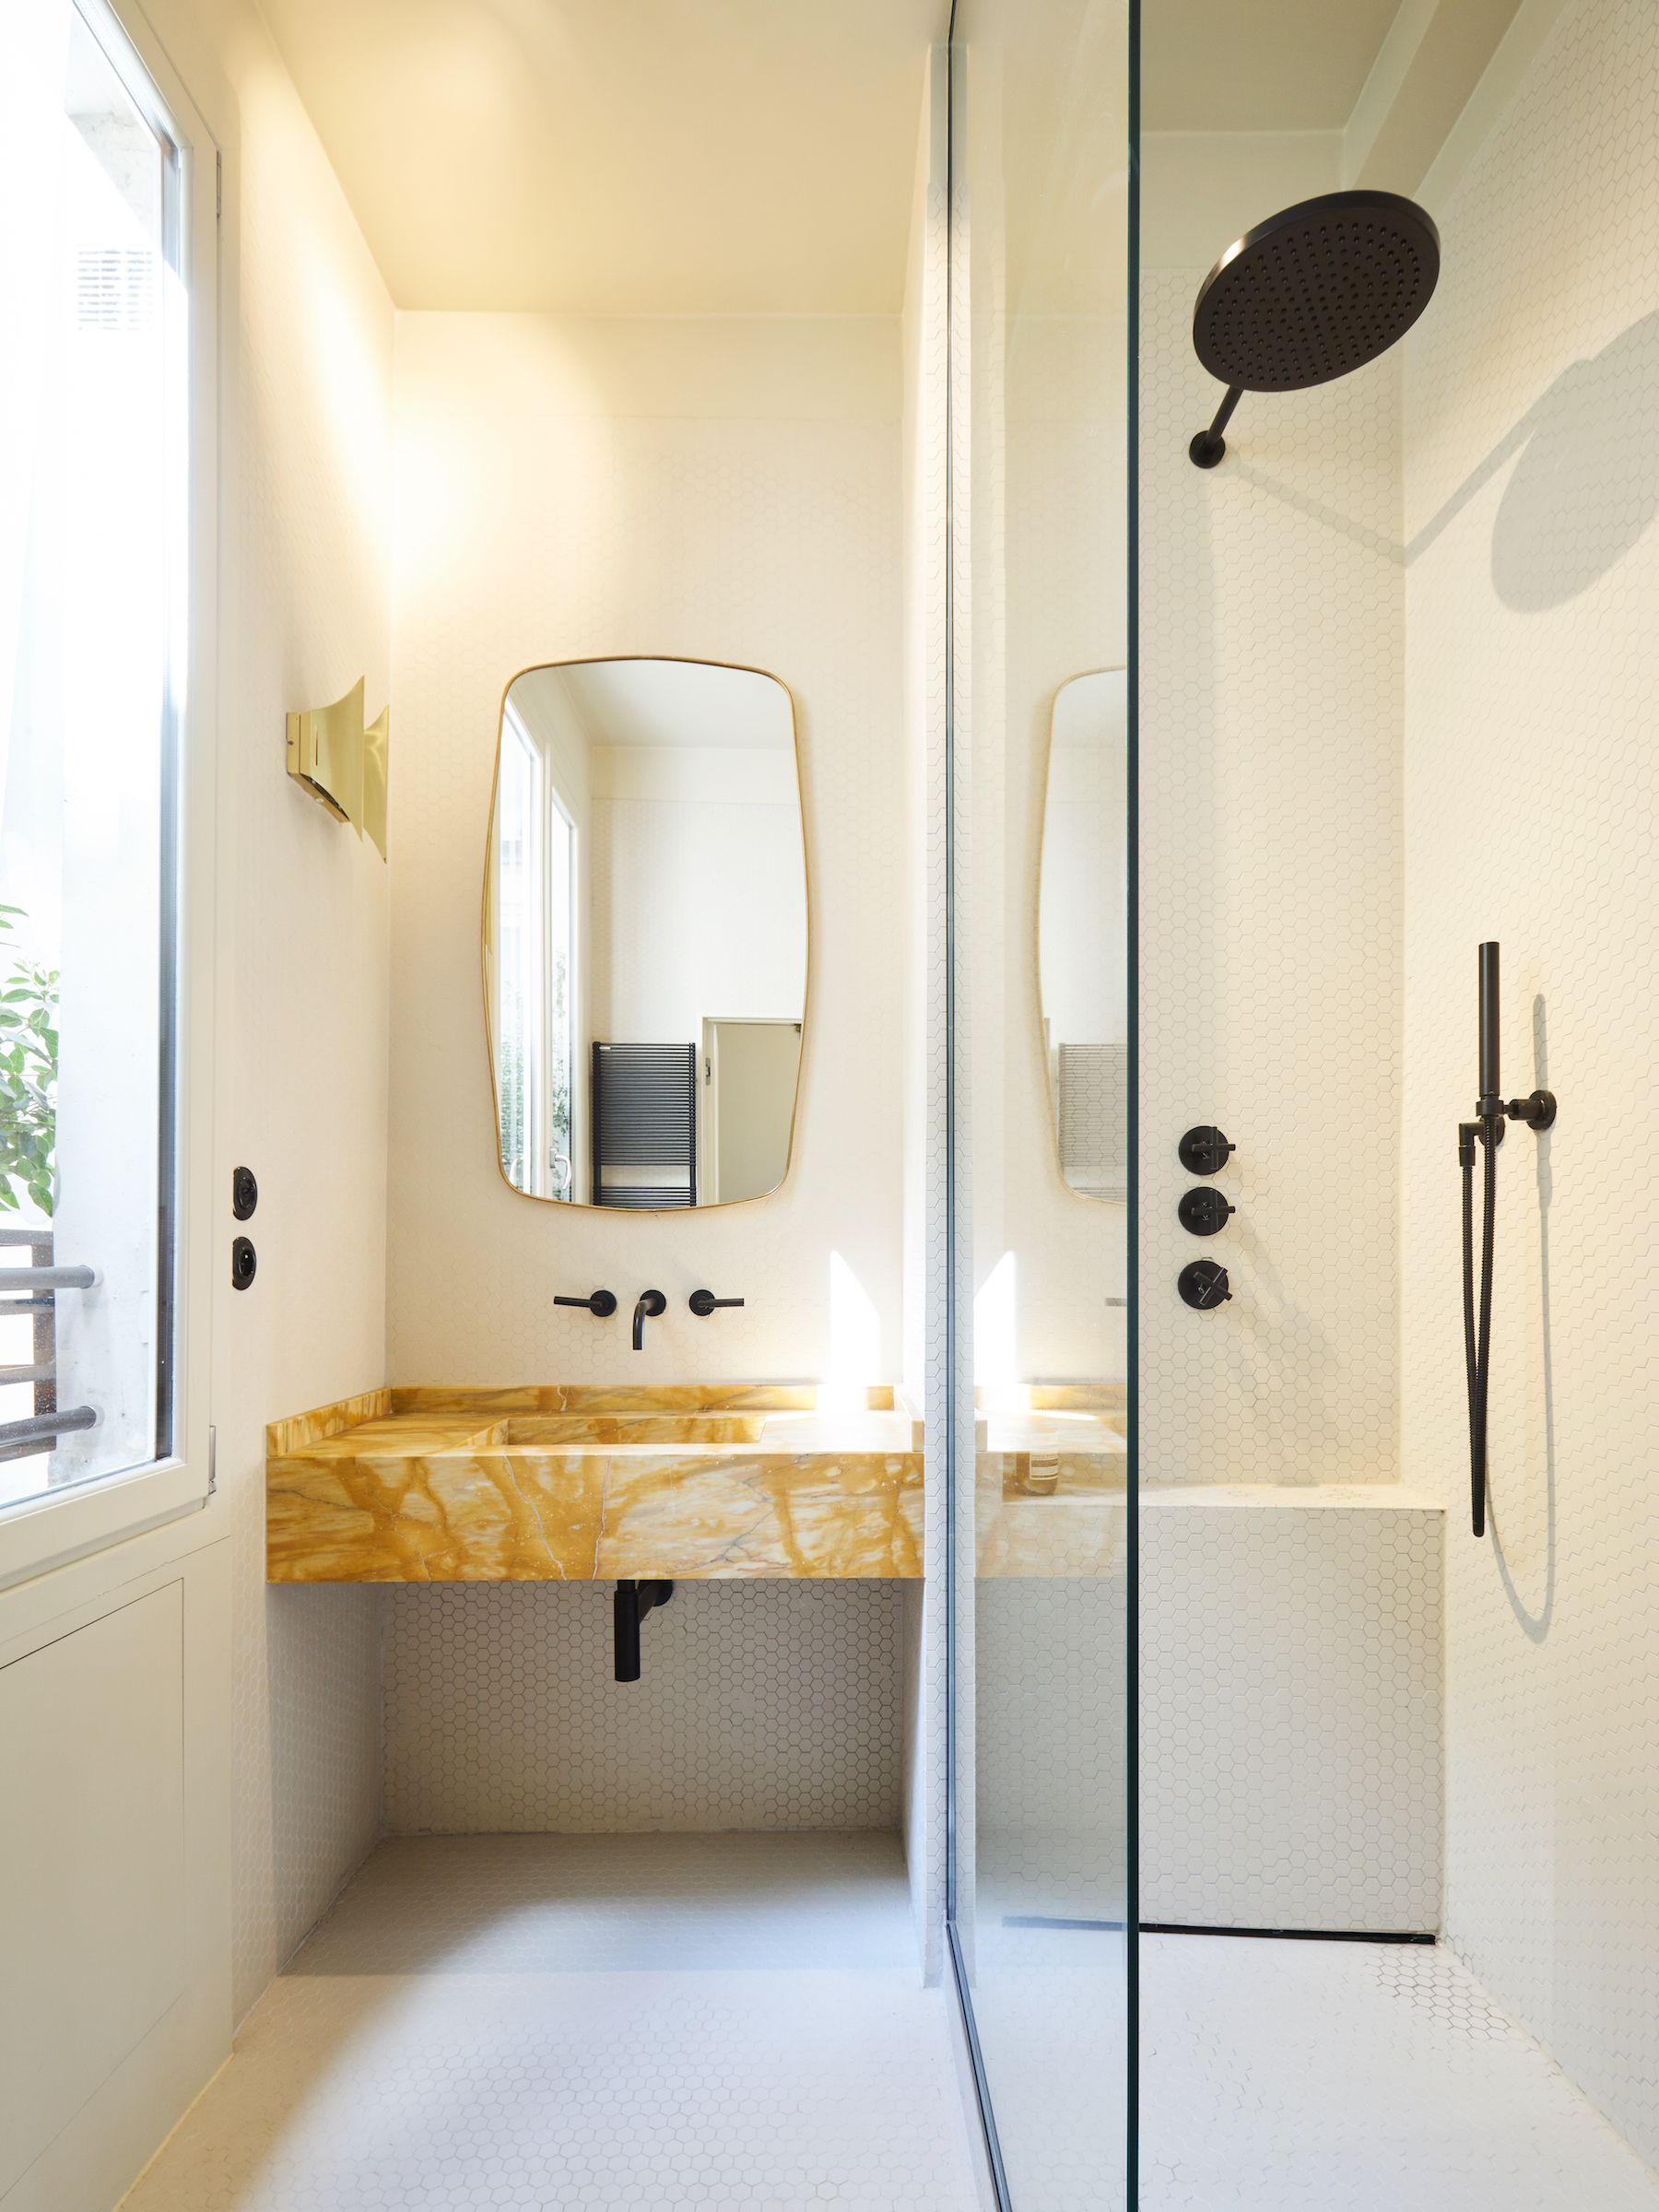 Poissonniere Furnituresanitary Ware Bathroom Modern Bathroom - Nice-apartment-bathrooms